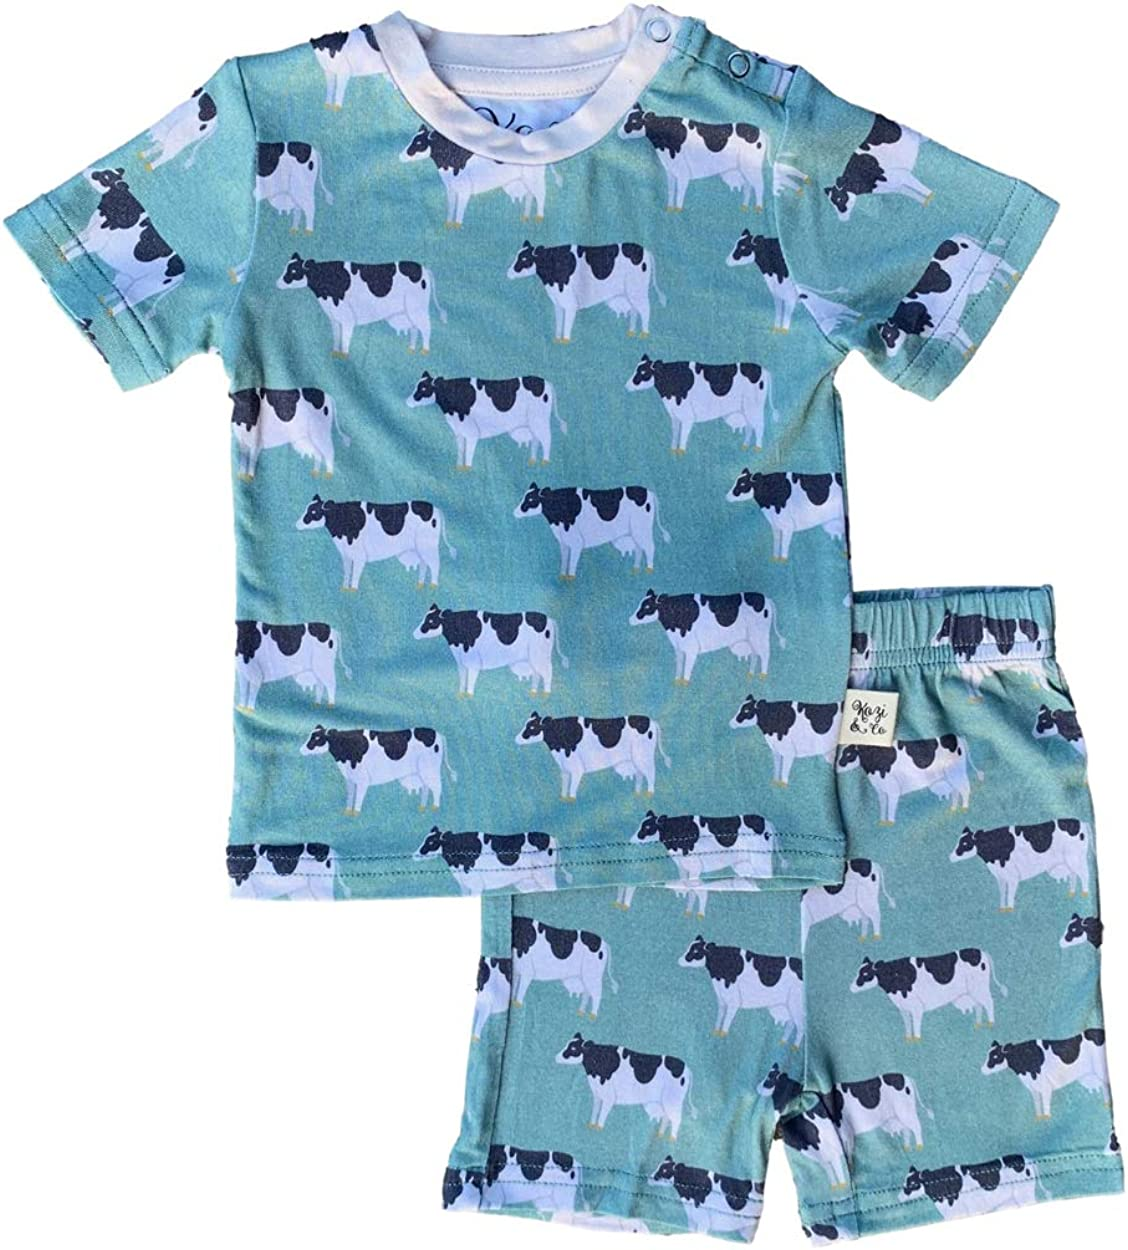 Pajama Set Girls and Boys Short Sleeve Kozi /& Co PJs Pajamas